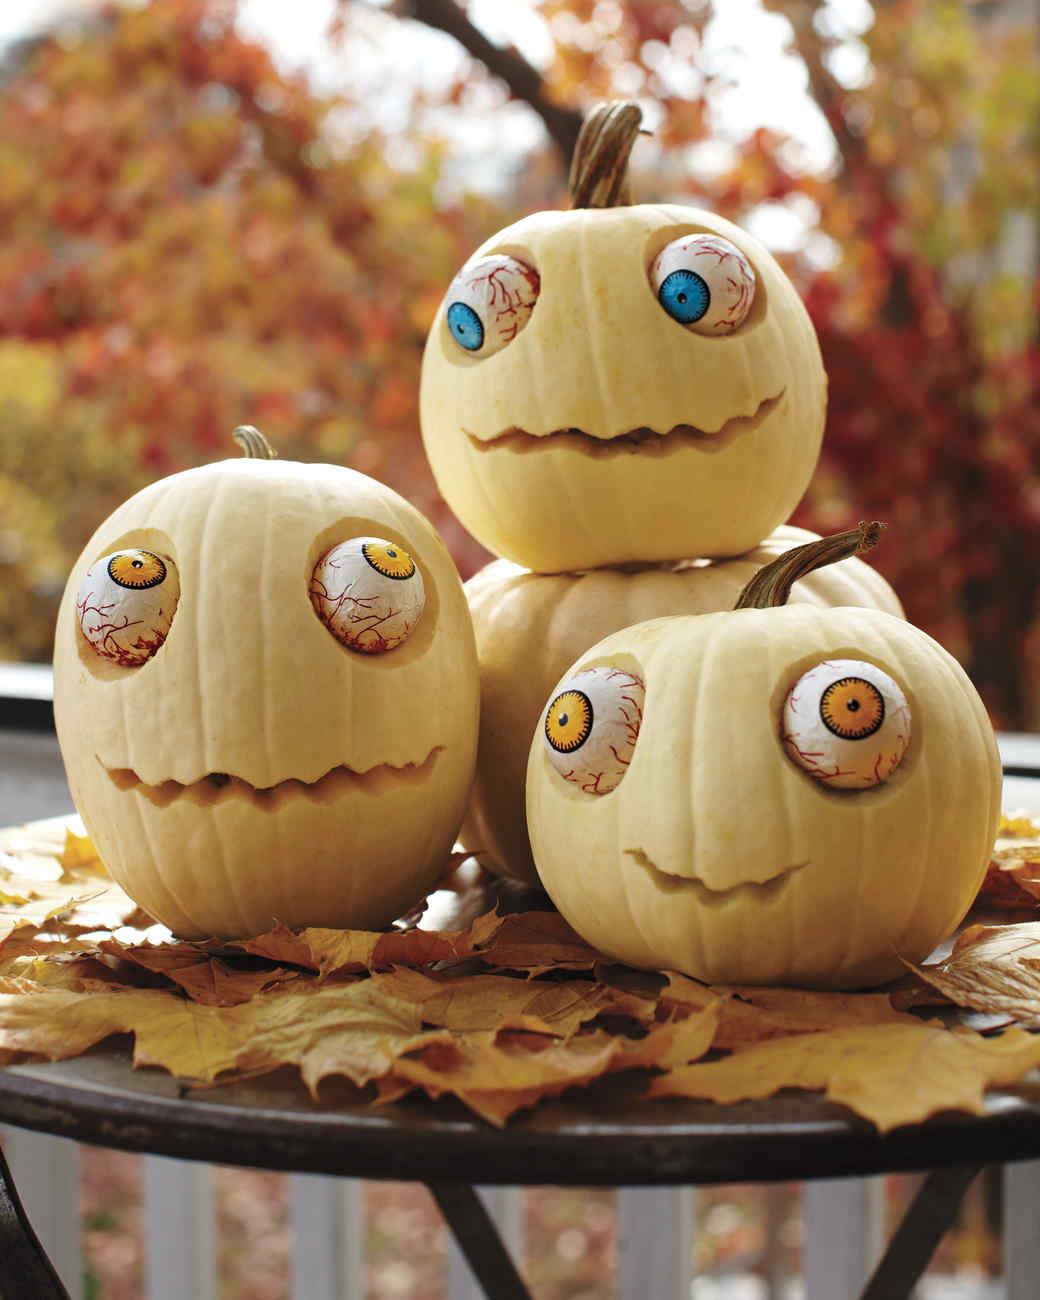 zombie-pumpkin-1011mld106876.jpg